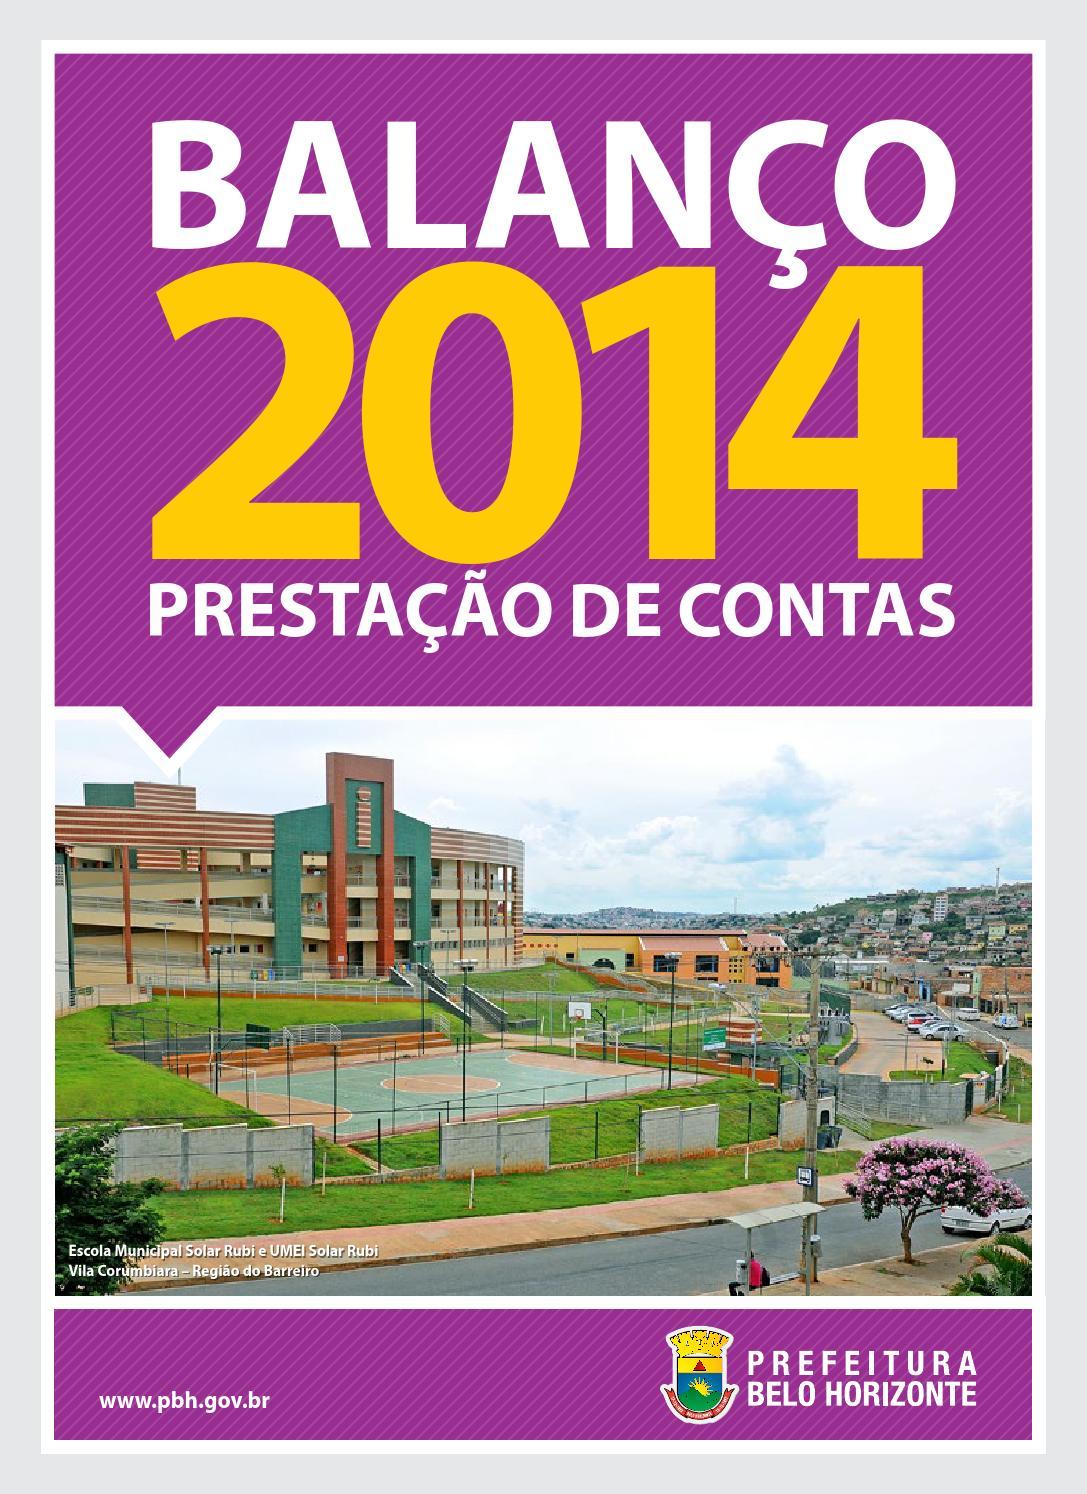 bbcbd4ecc8c Balanço 2014 by PBH Geel - issuu